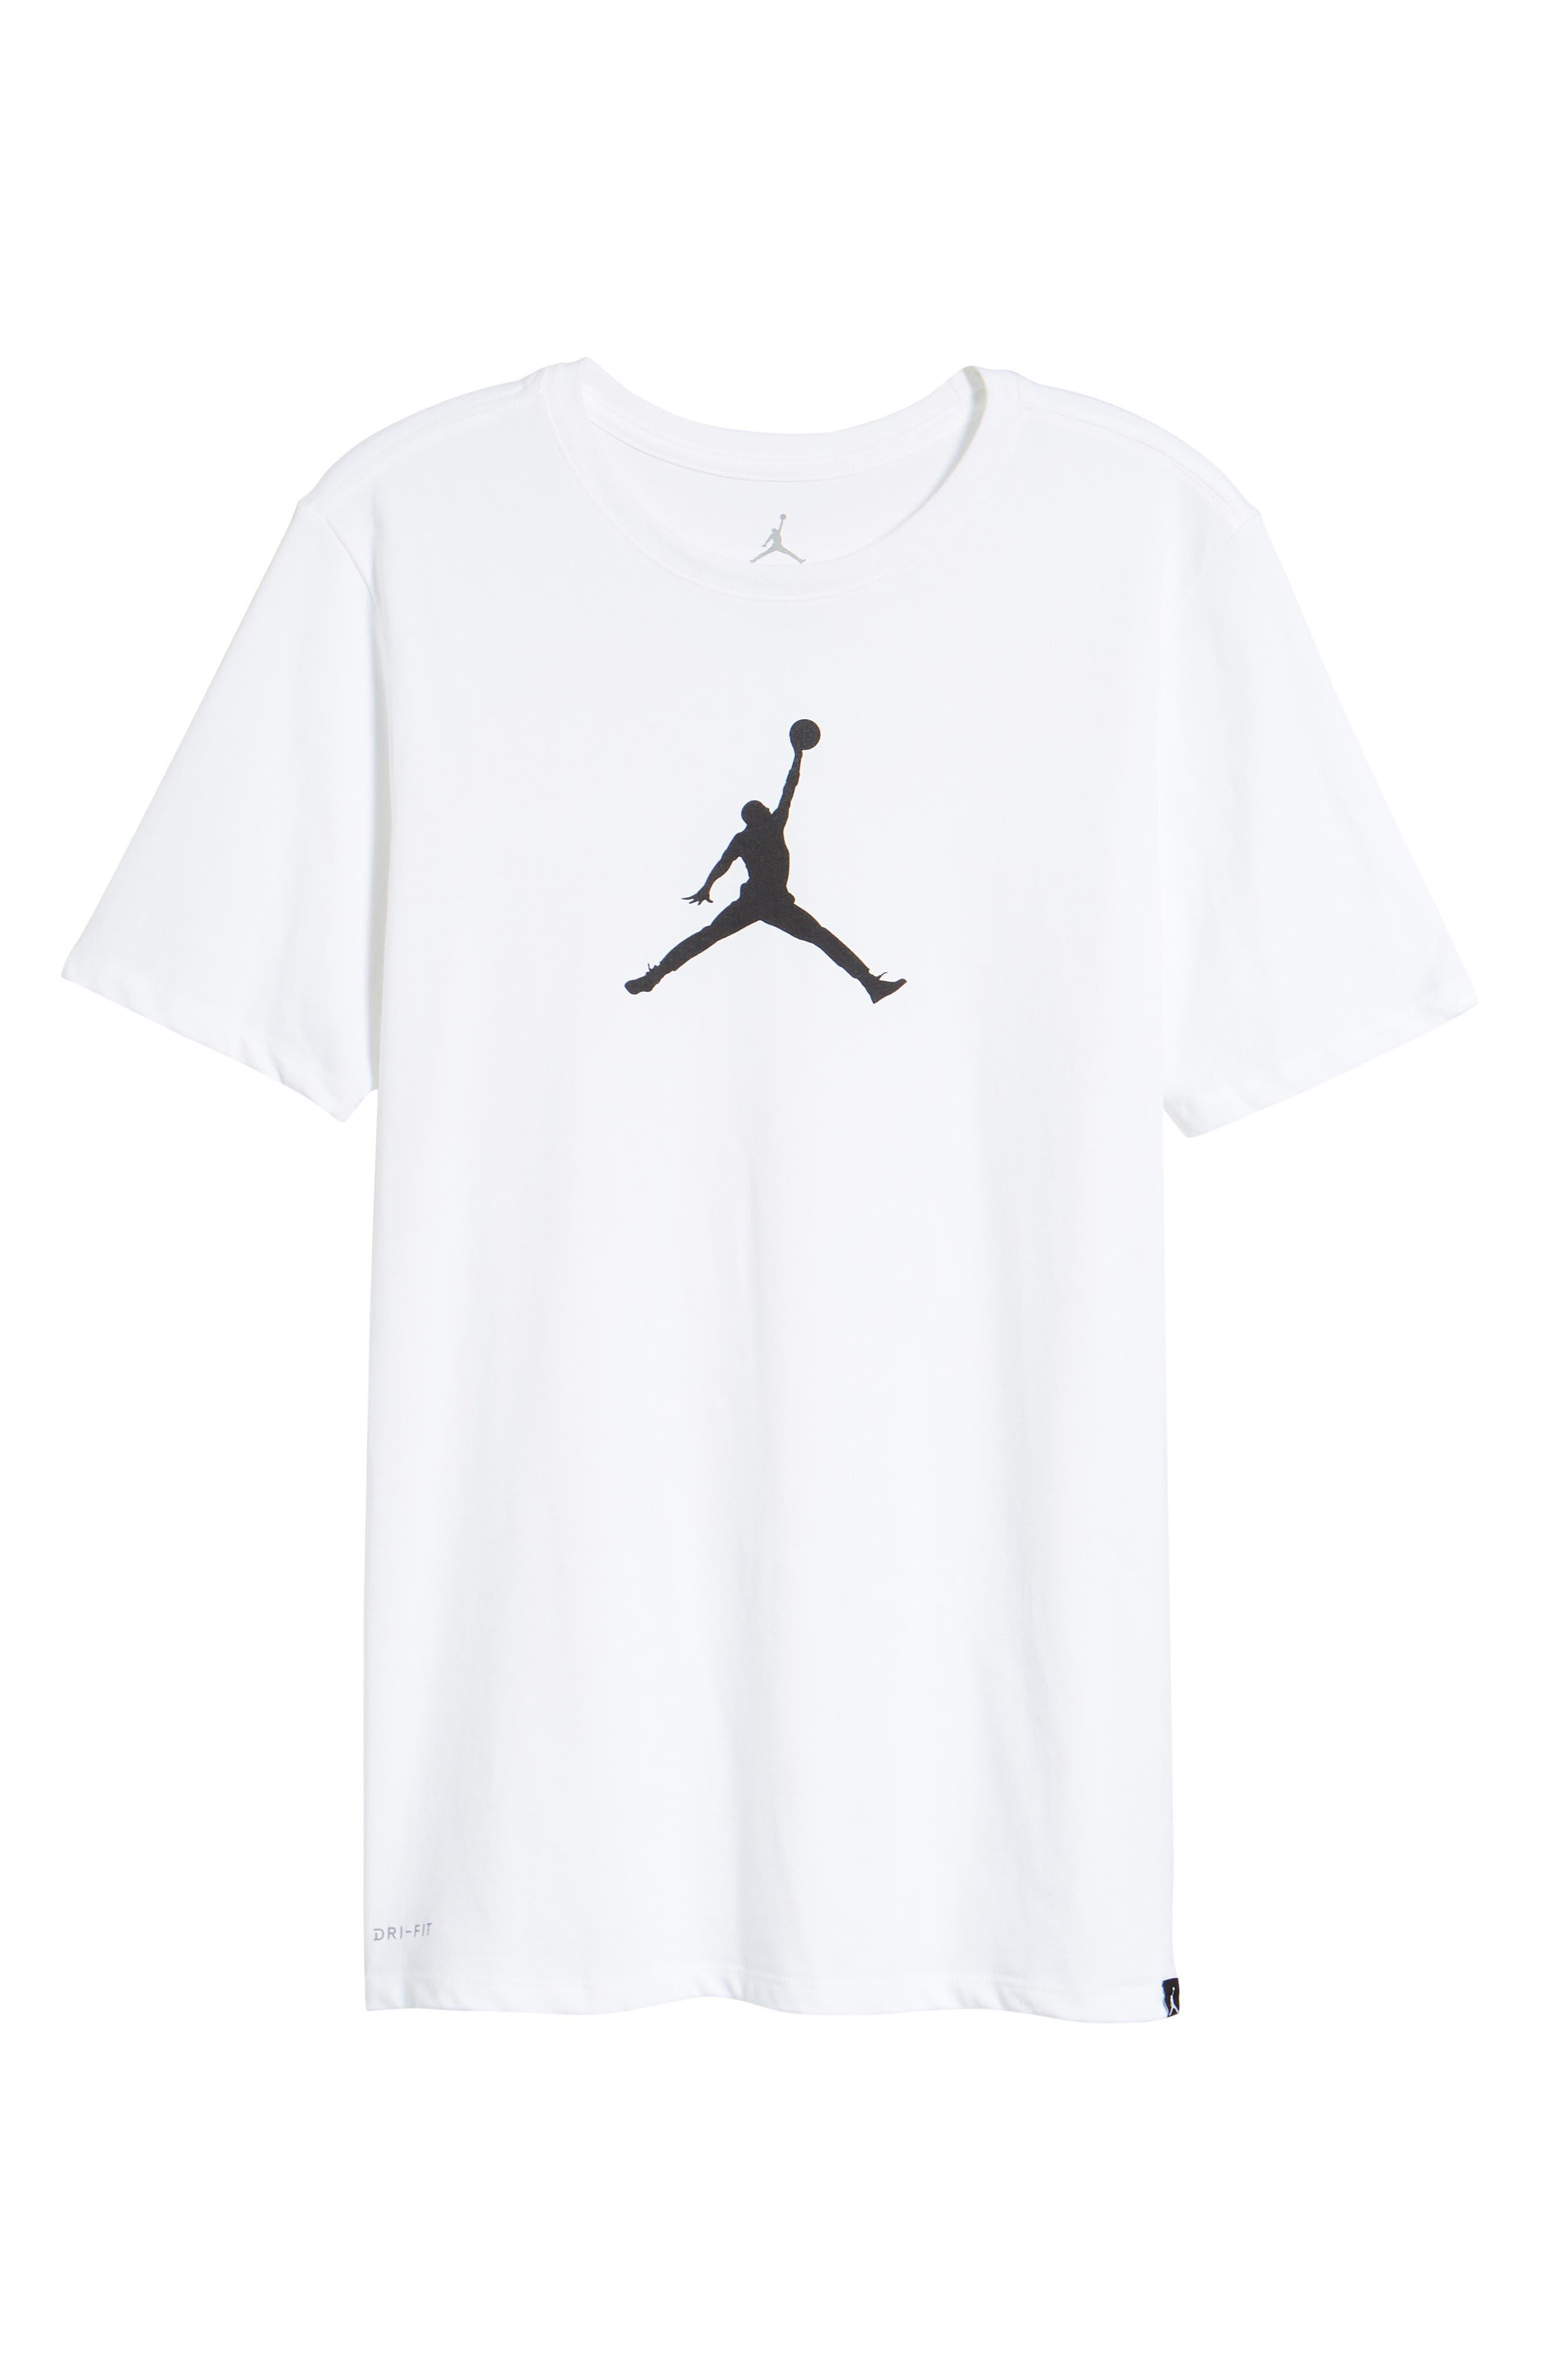 Iconic Jumpman Graphic T-Shirt,                             Alternate thumbnail 12, color,